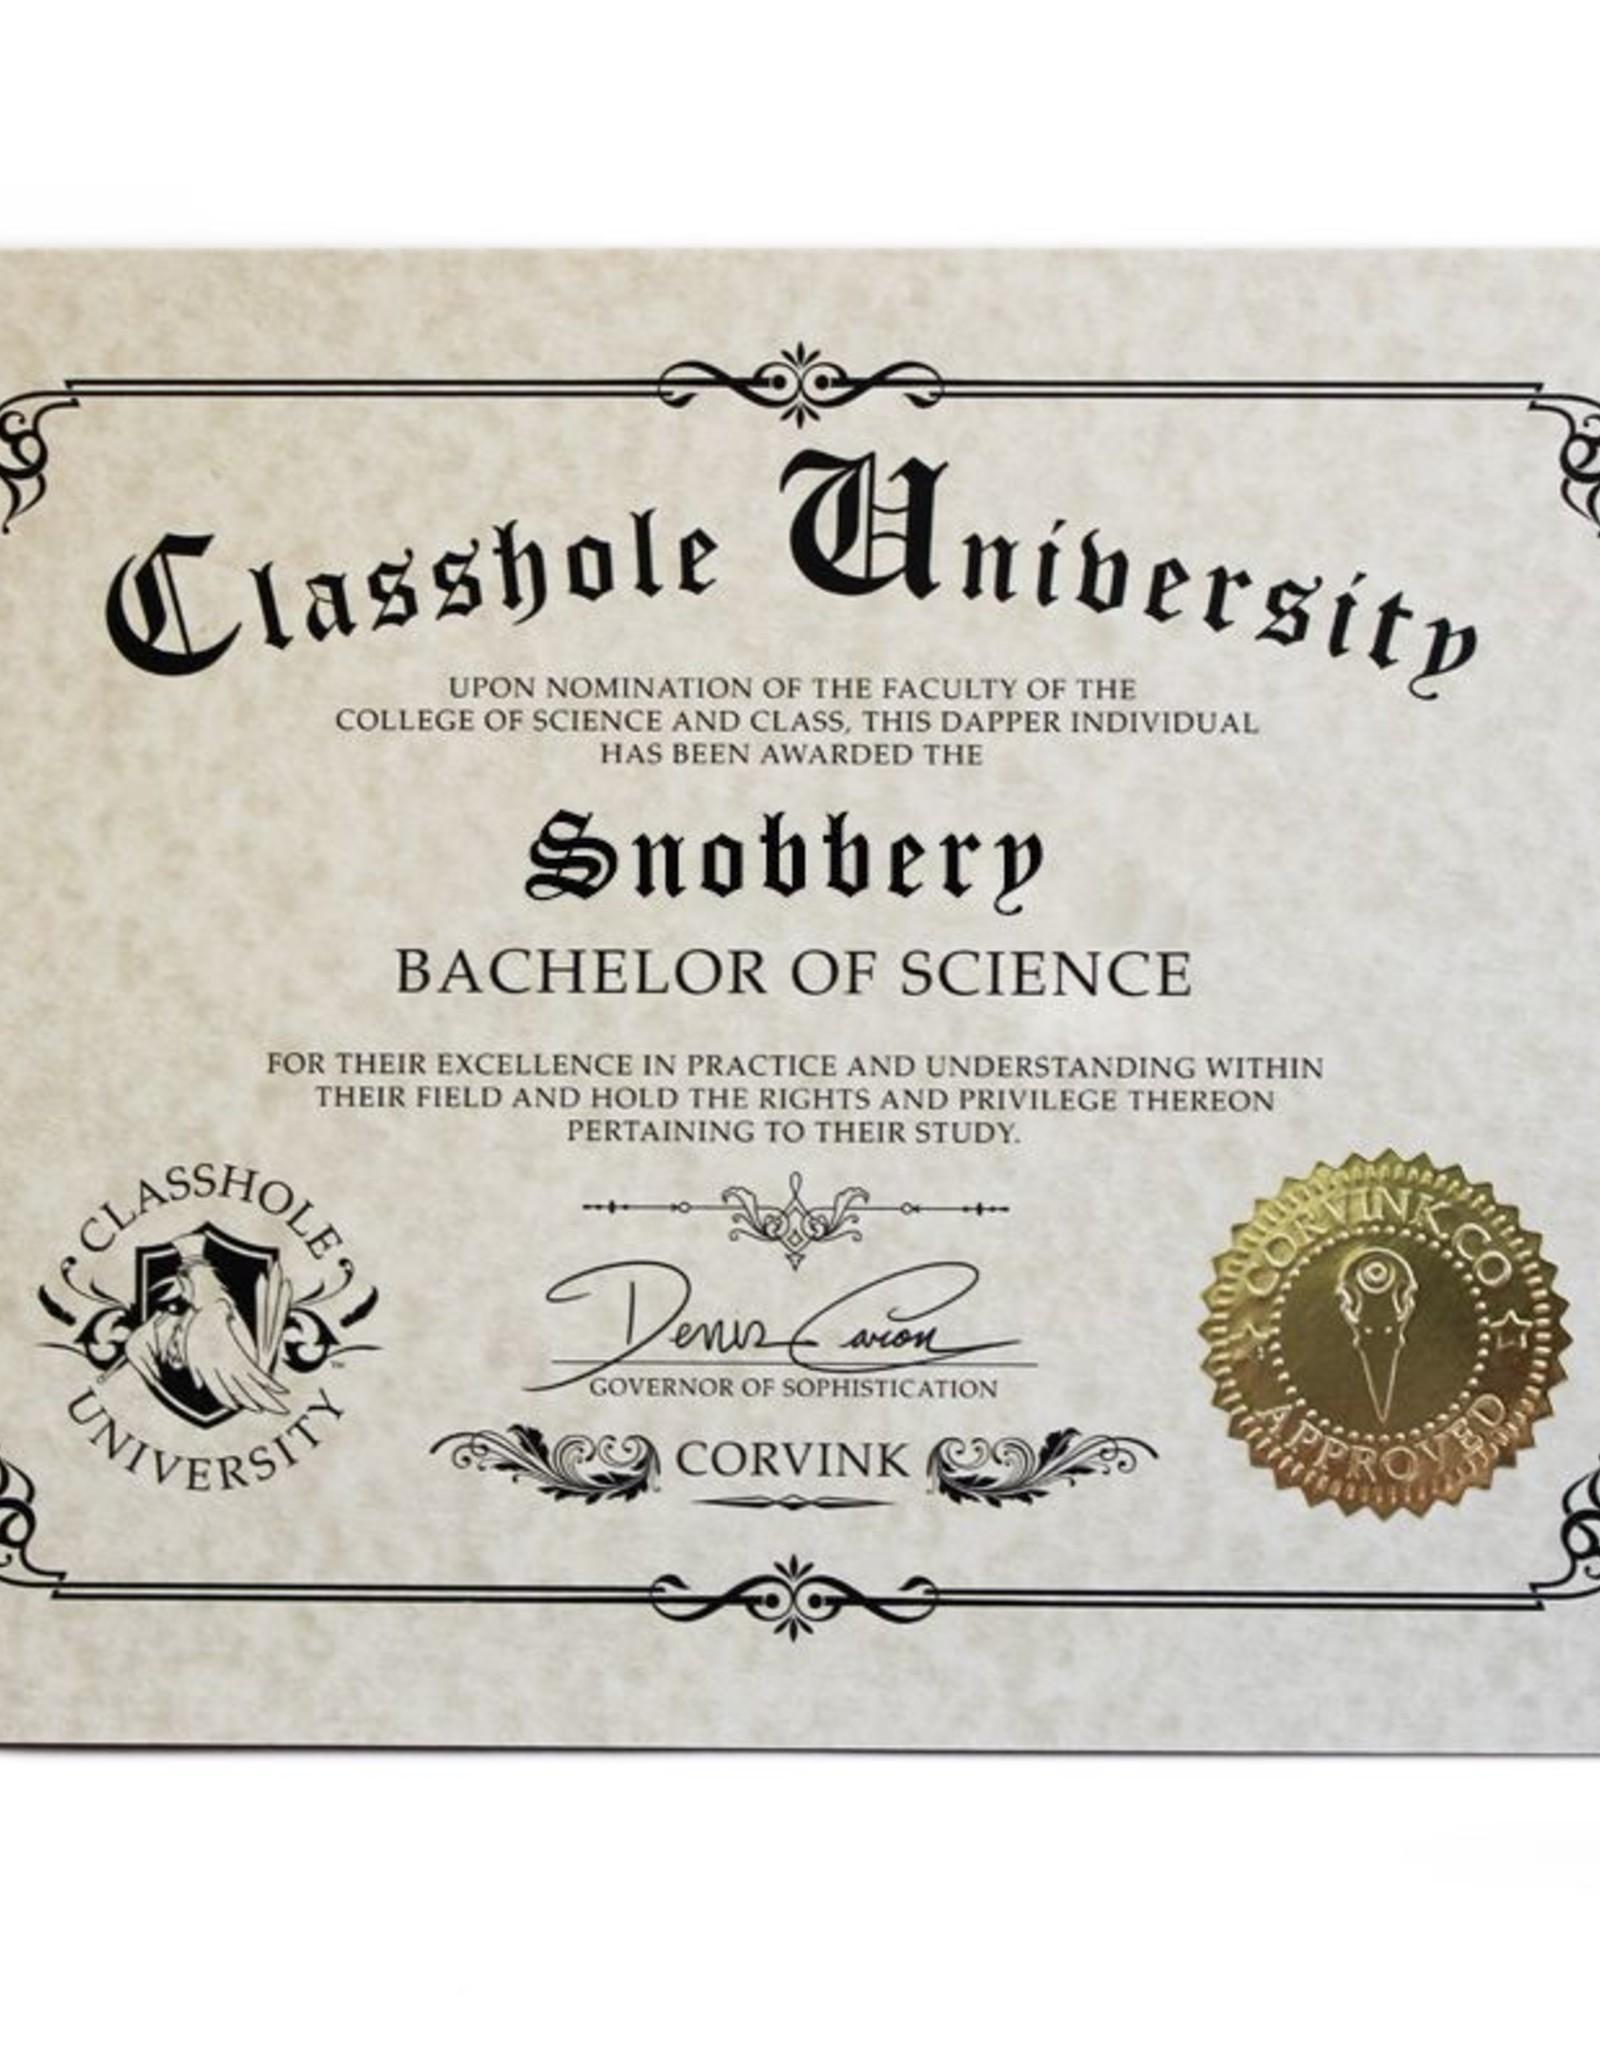 Classhole University BS Diplomas - Snobbery